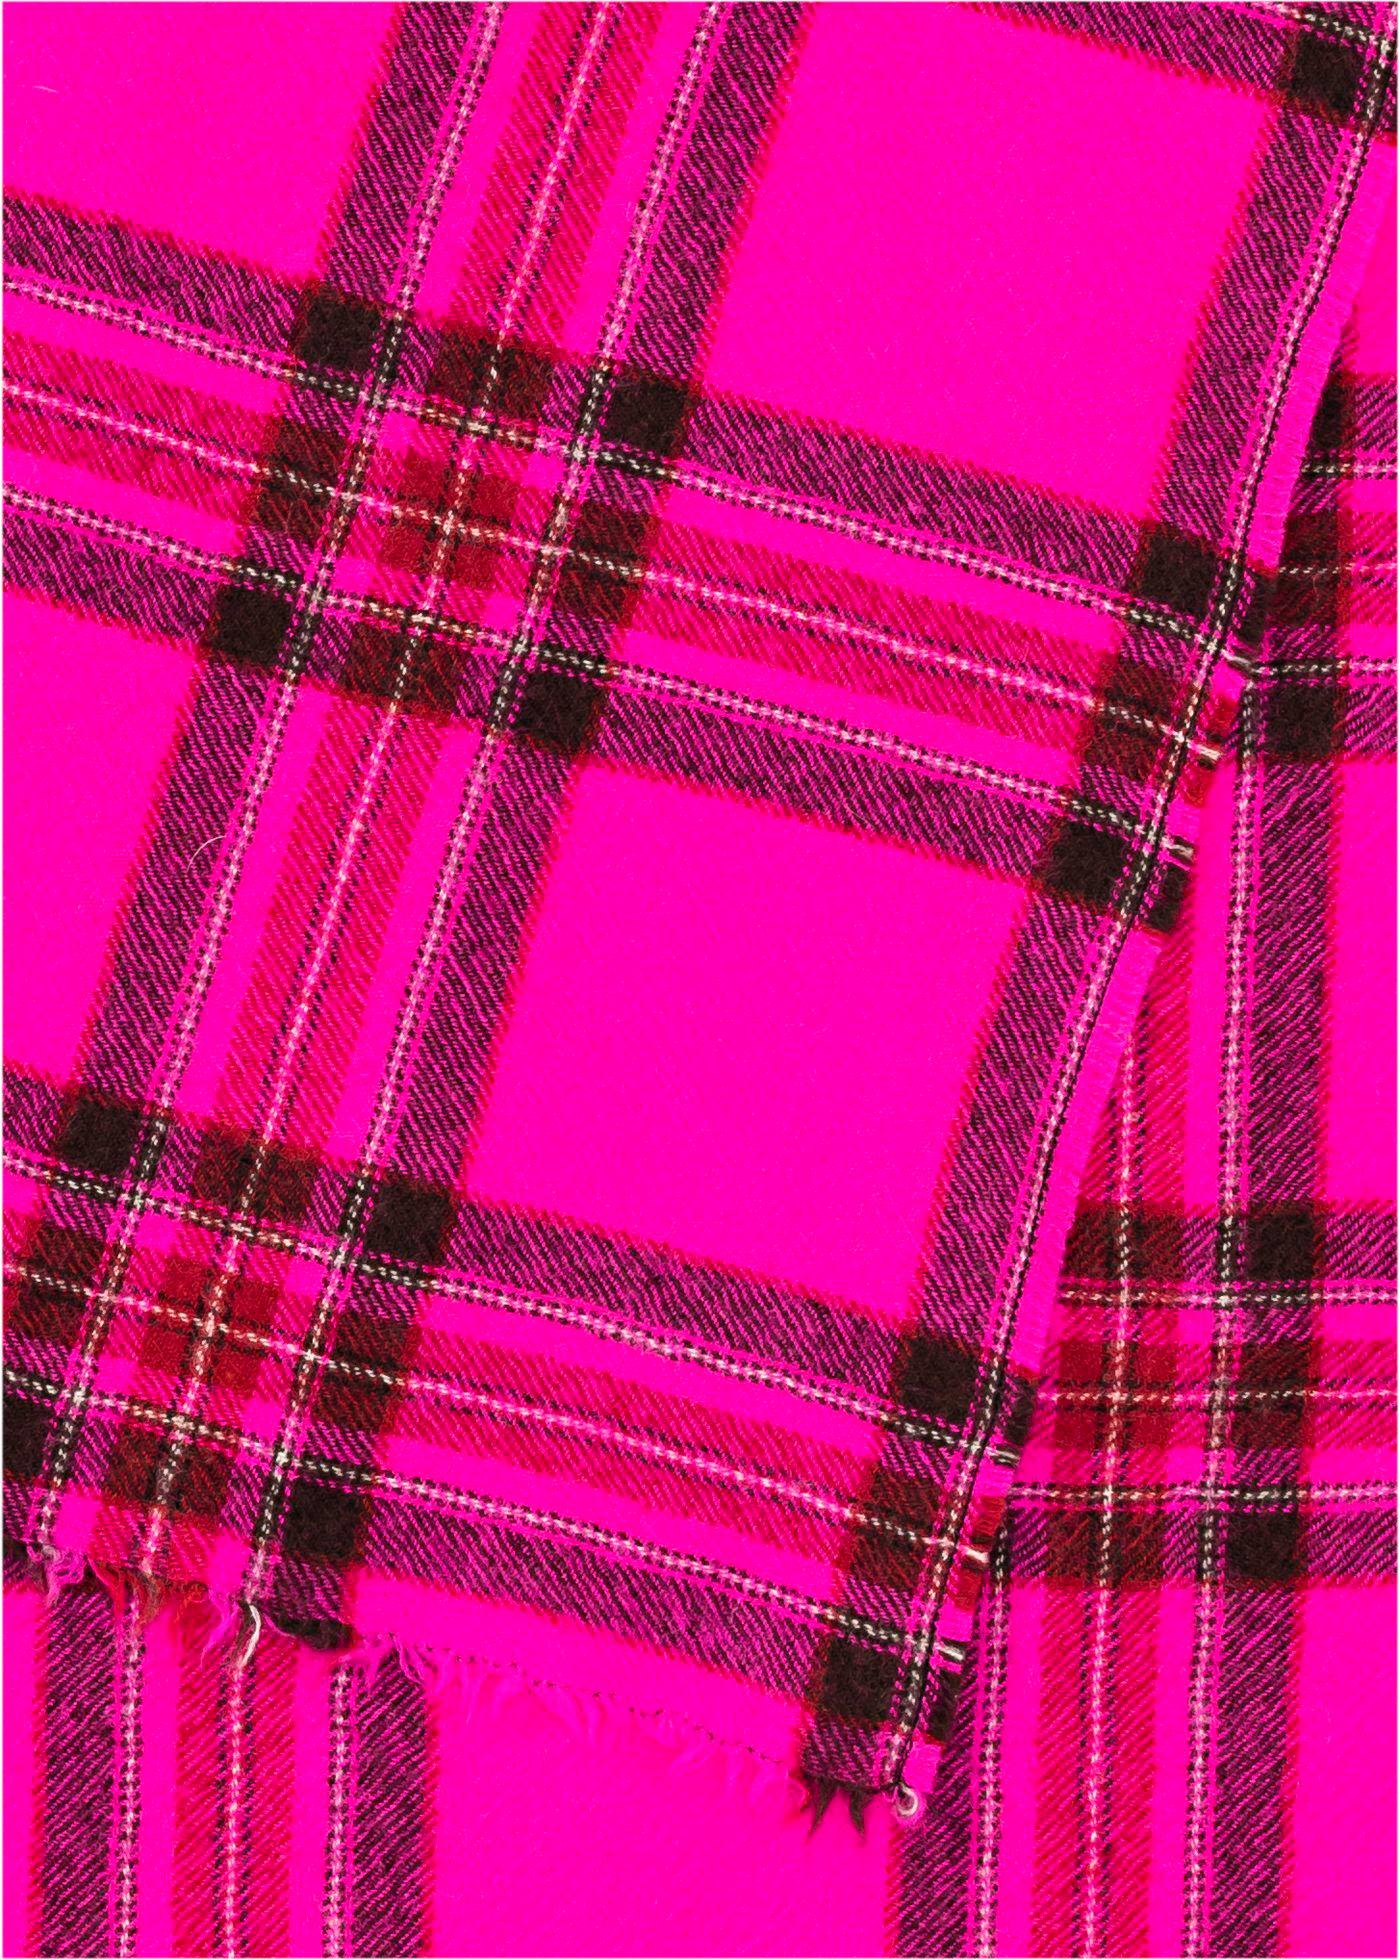 Halstuch, foulard image number 1